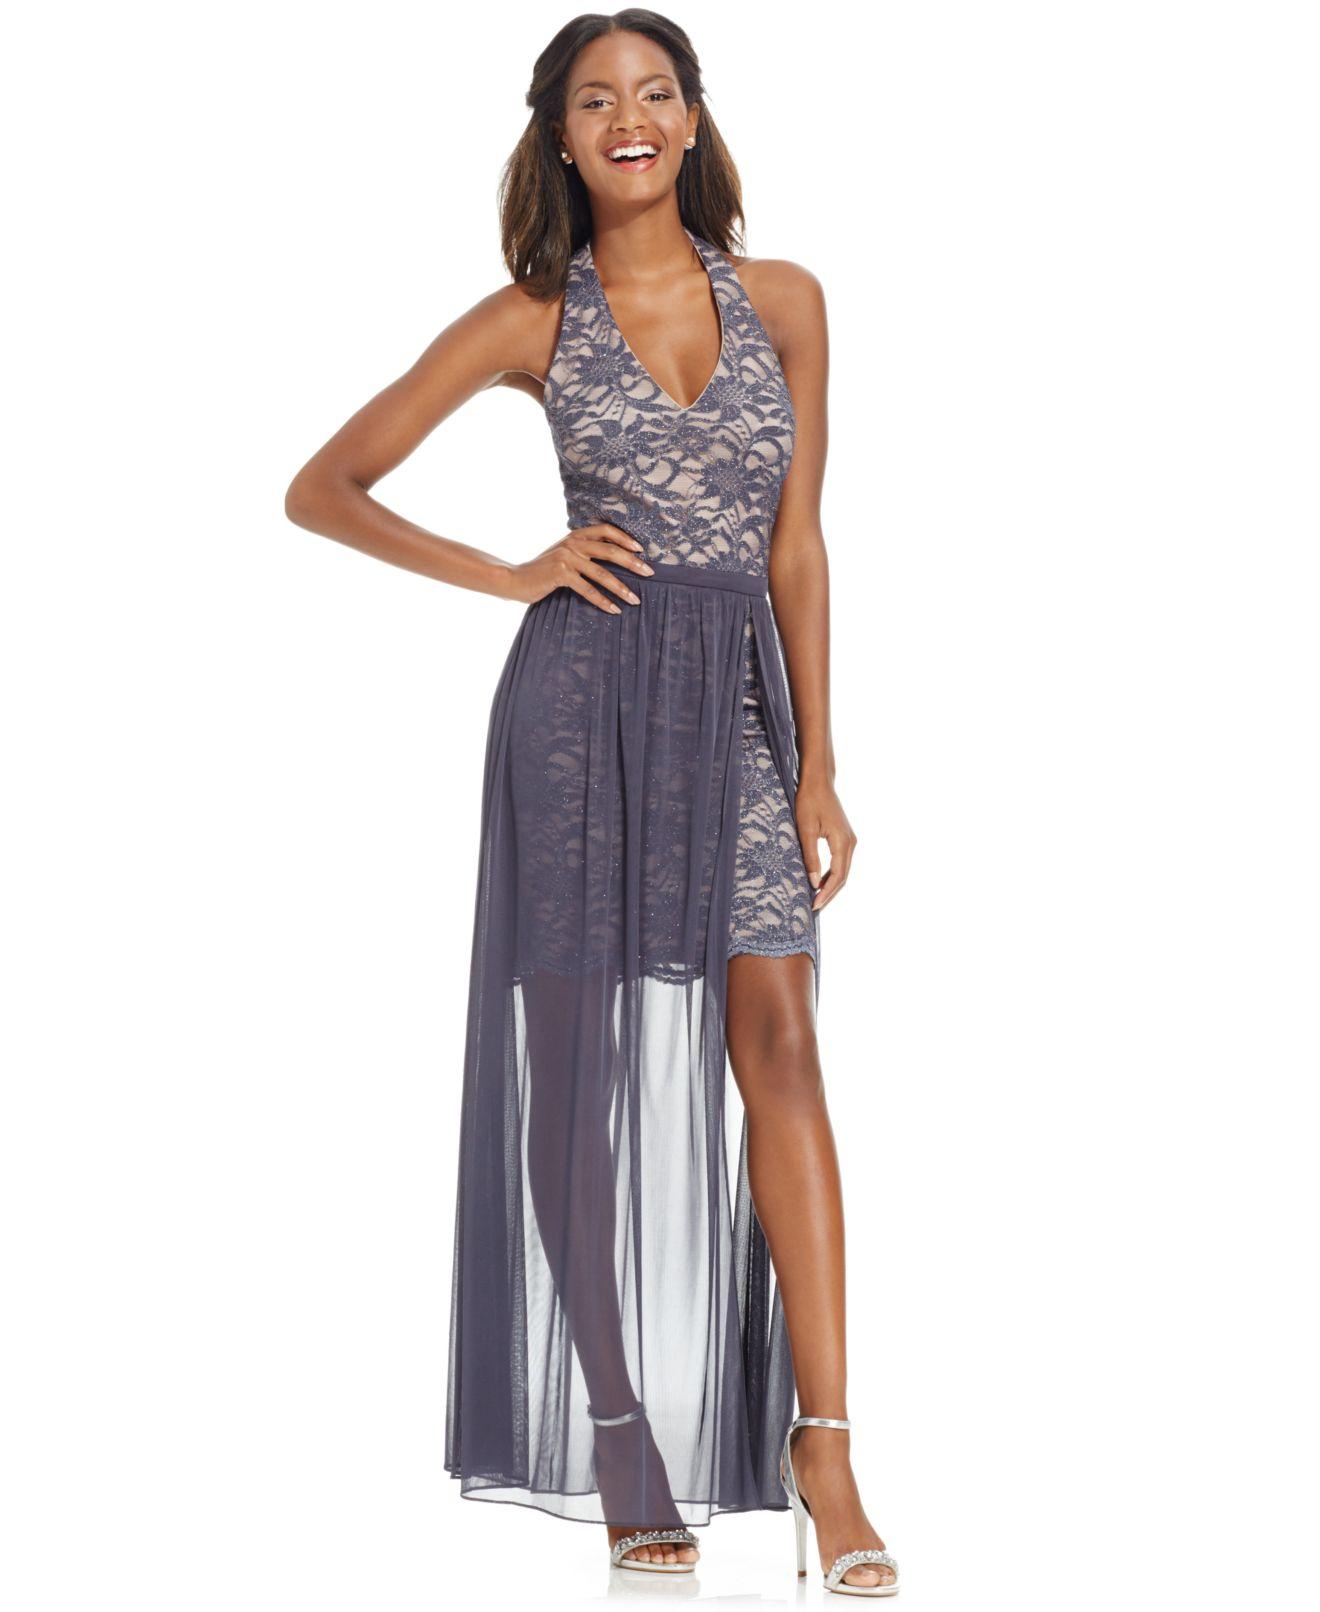 Cheap Cocktail Dresses Under 20 Dollars - Plus Size Prom Dresses